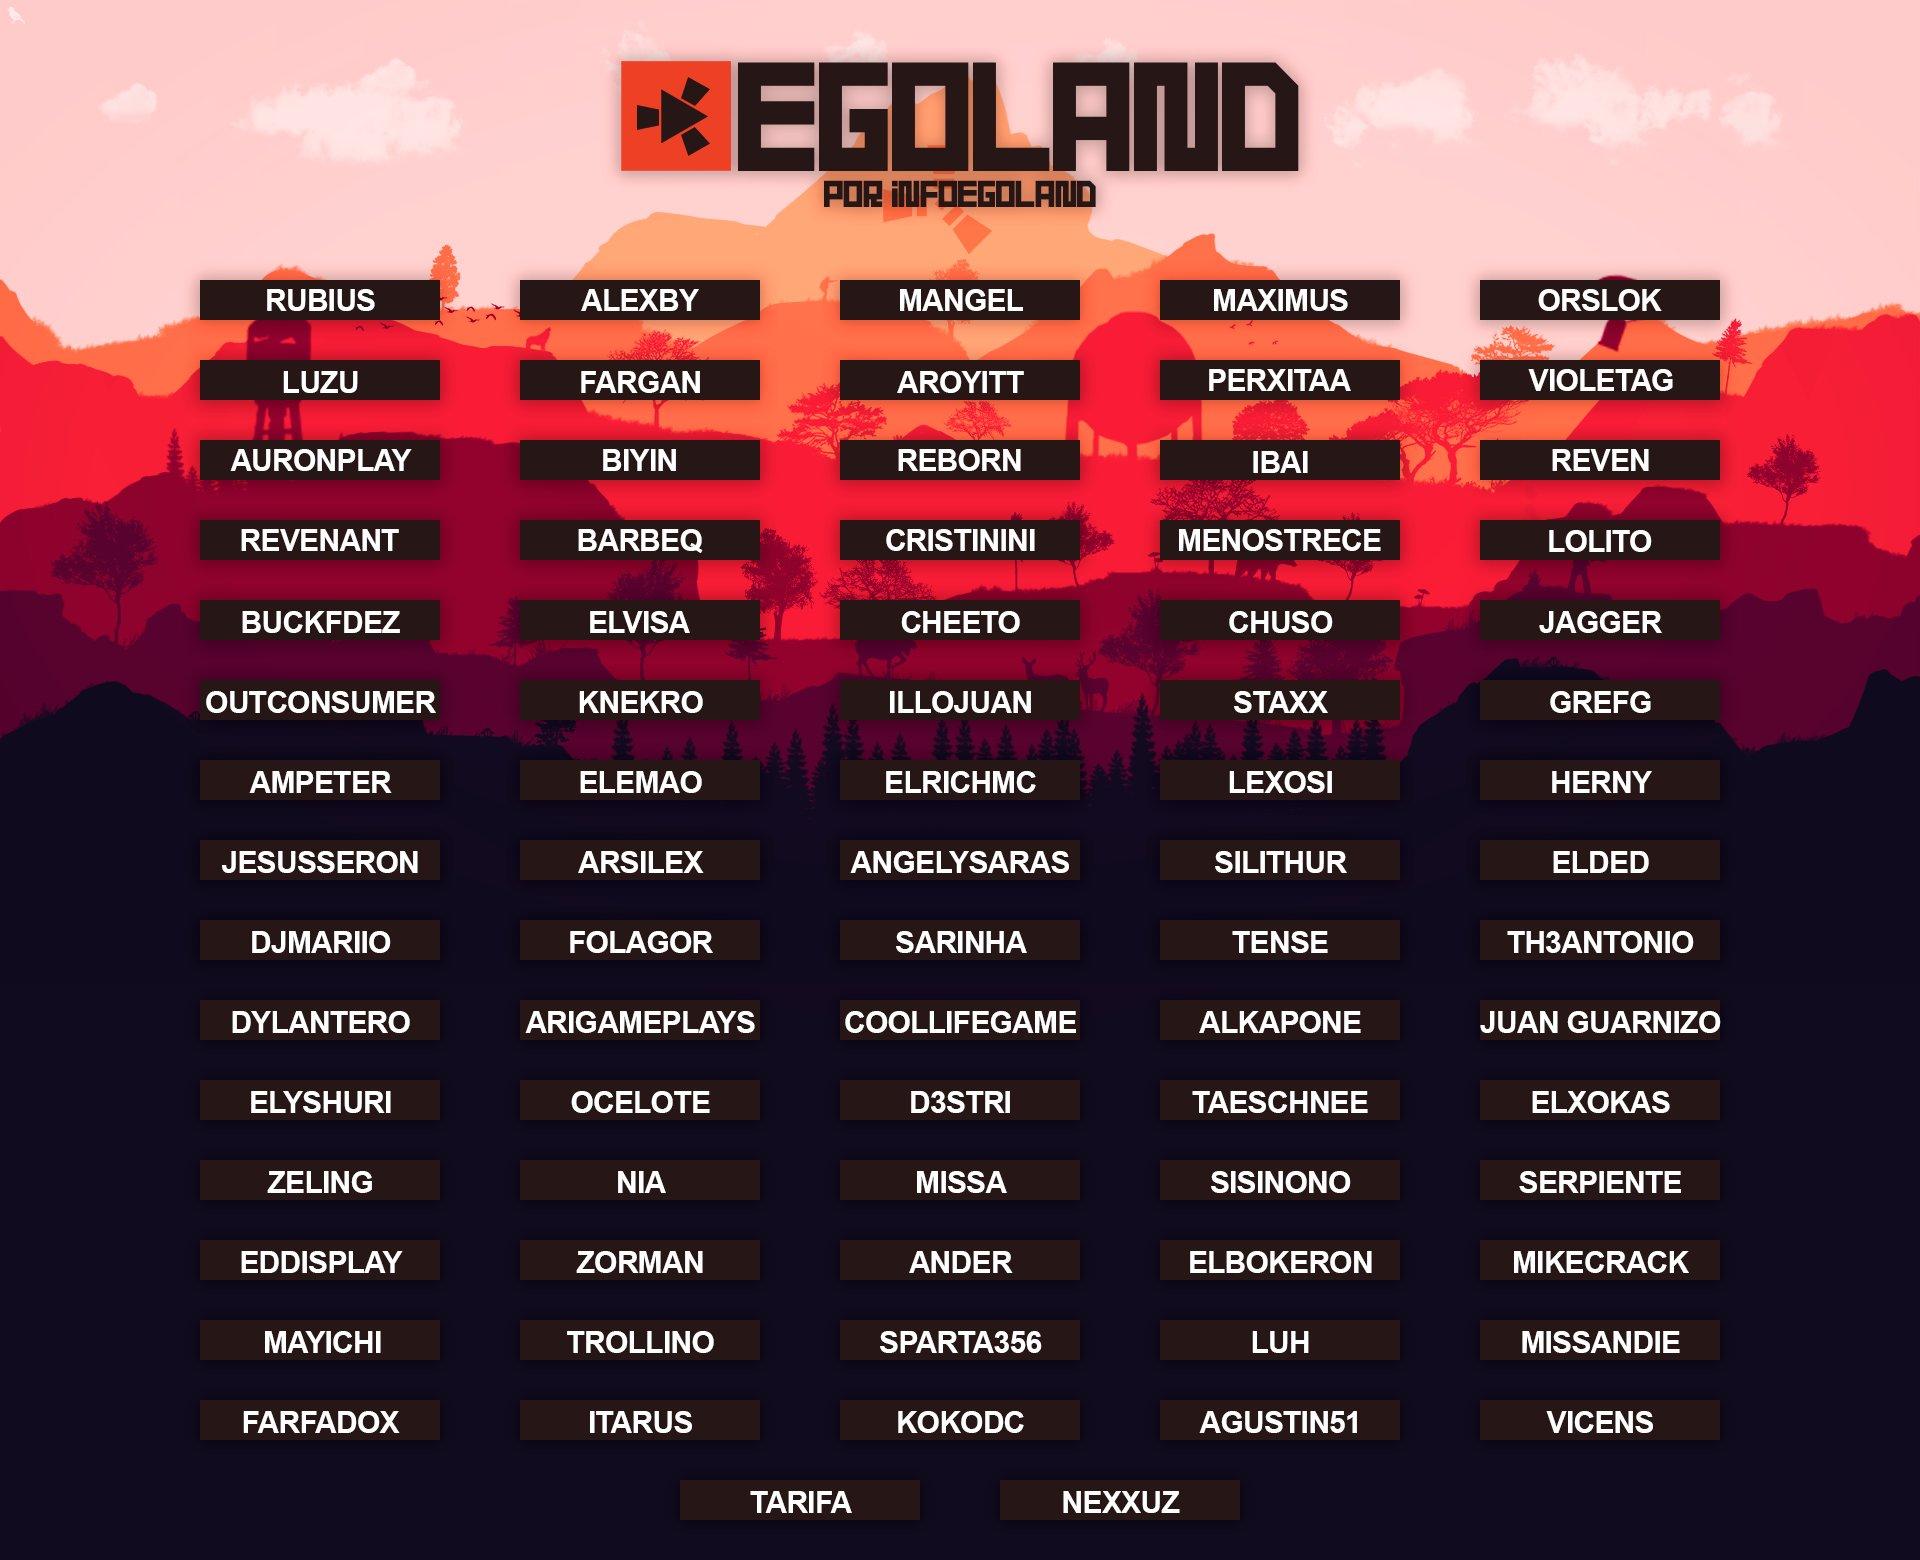 lista participantes youtubers egoland